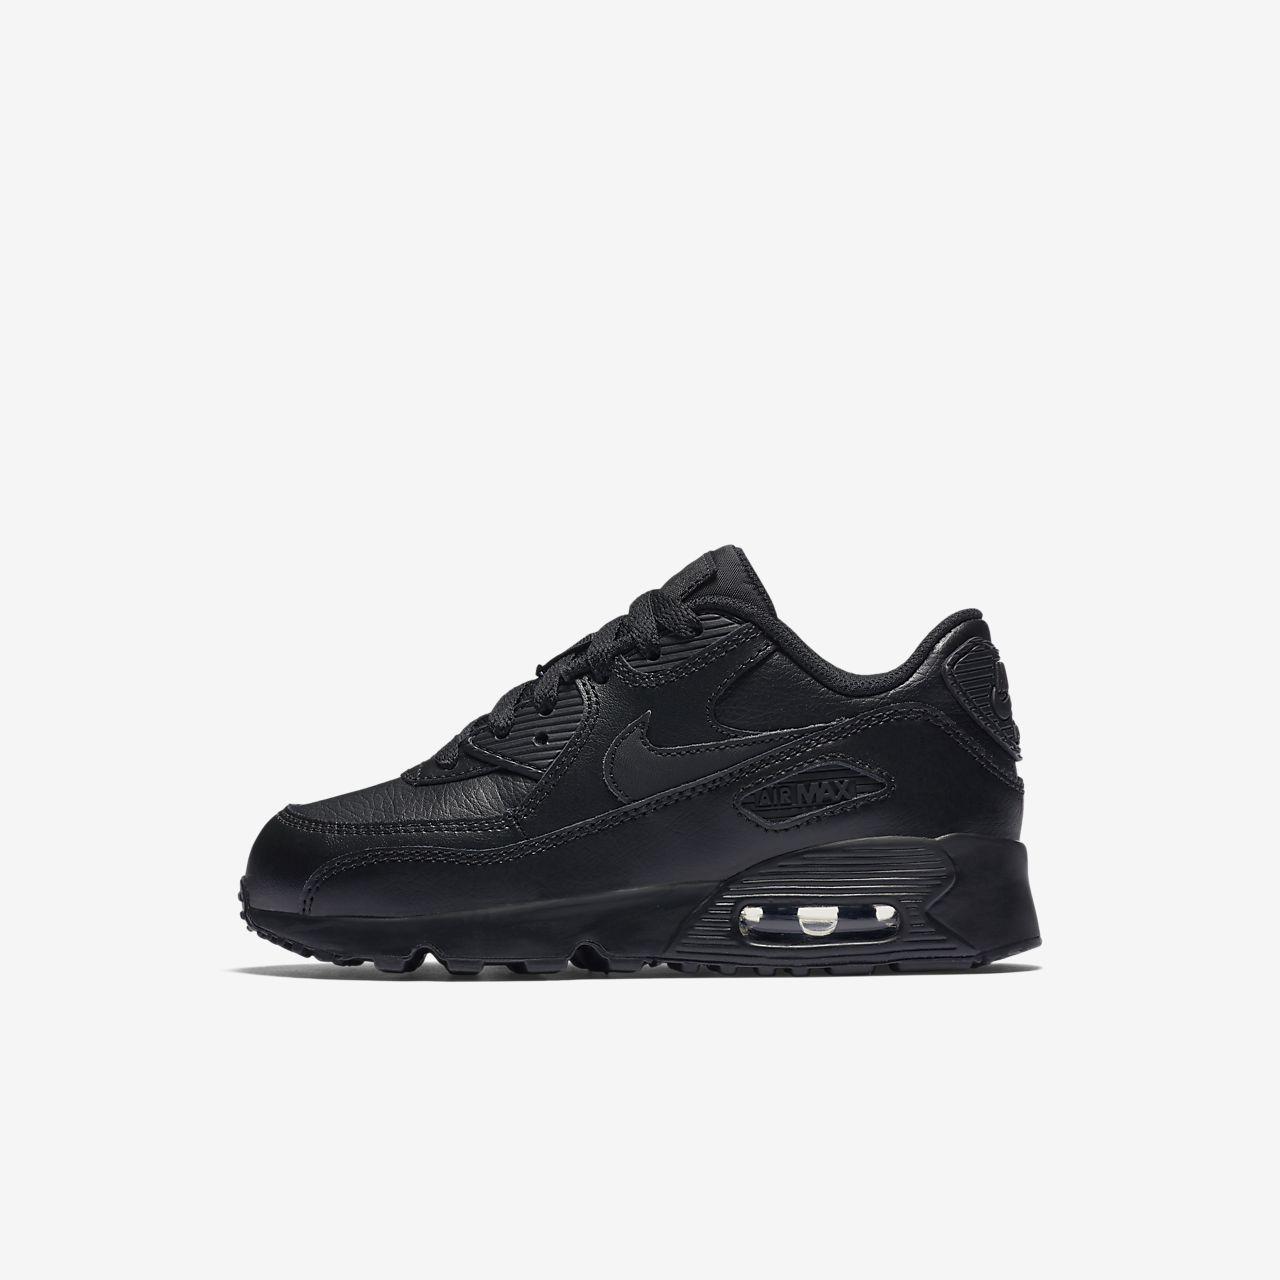 f0b7b97d686 Παπούτσι Nike Air Max 90 Leather για μικρά παιδιά. Nike.com GR